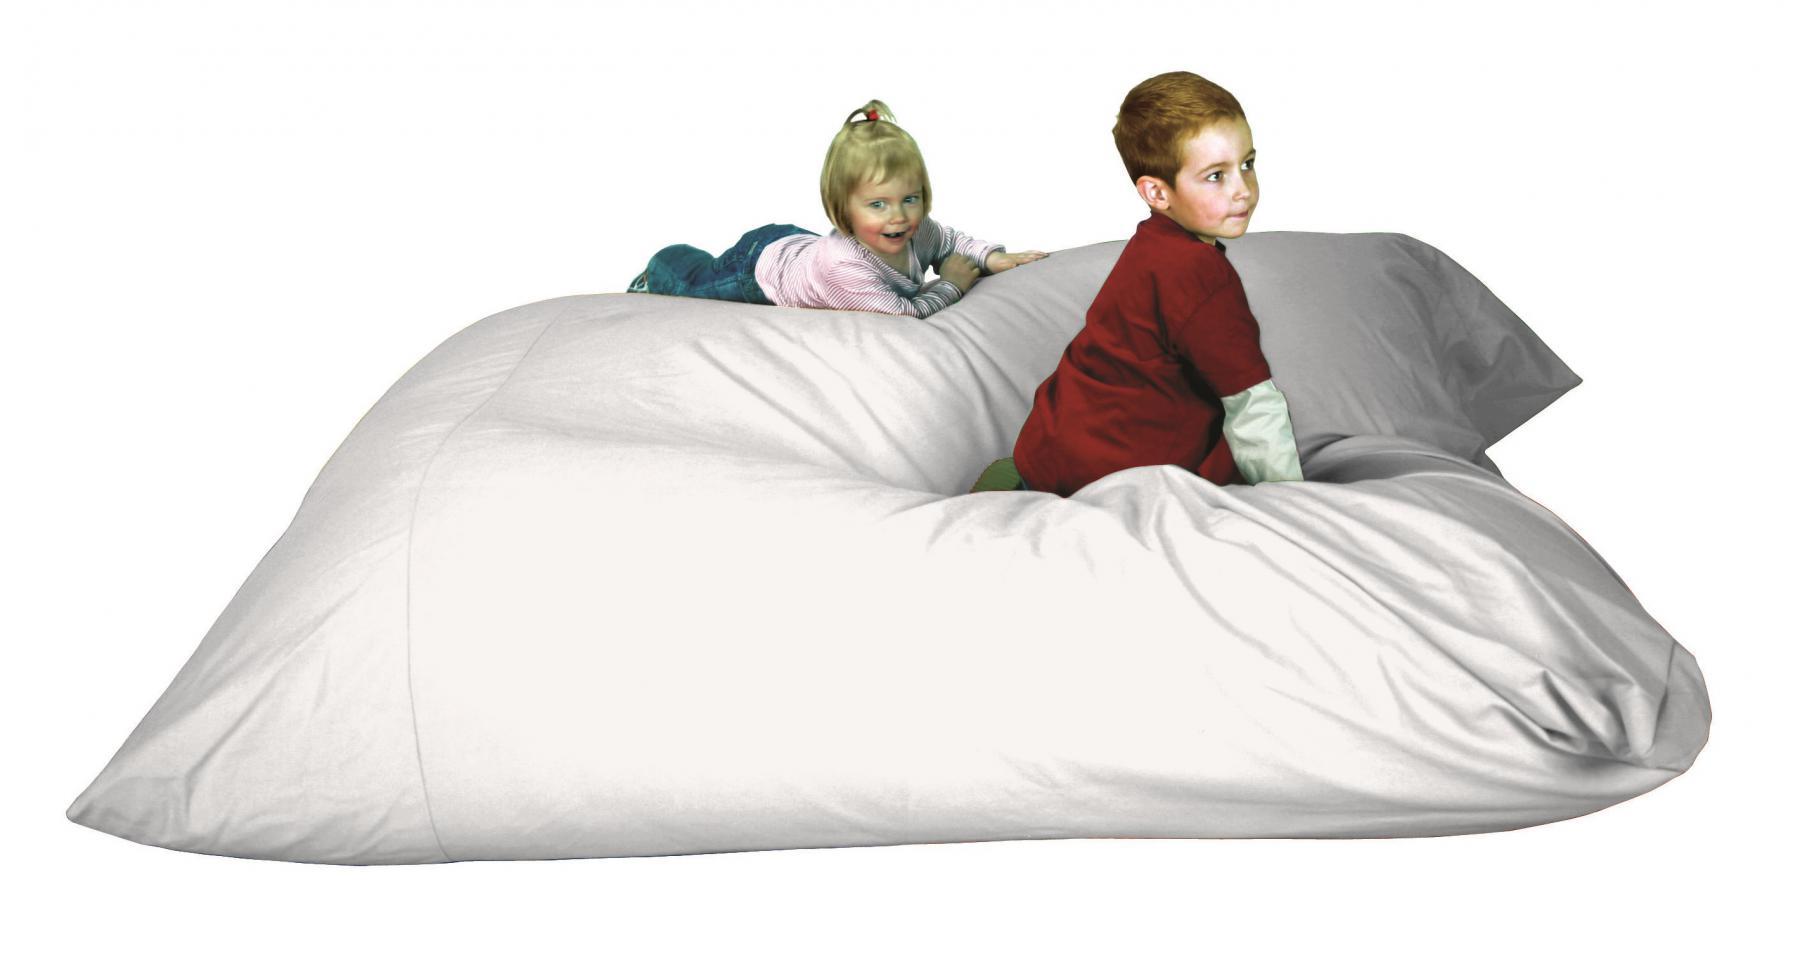 b nfer snoezel element kuschelkissen riesenkissen wei. Black Bedroom Furniture Sets. Home Design Ideas